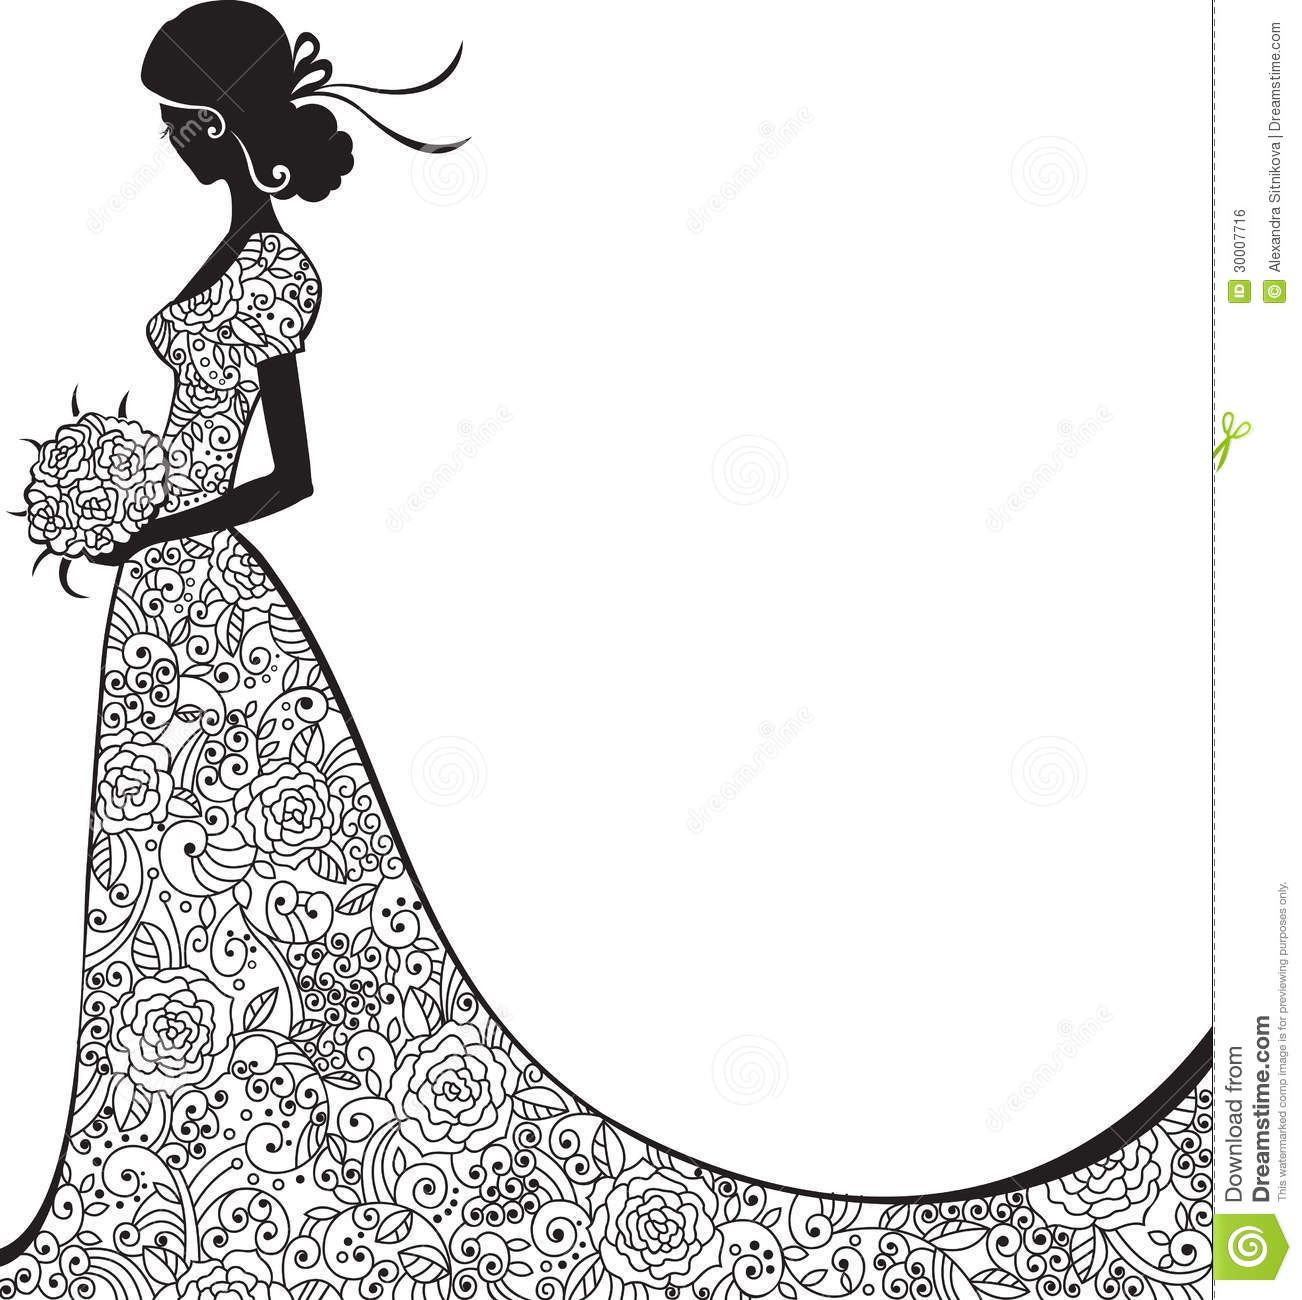 Bride clipart. Elegant wedding concepts visit